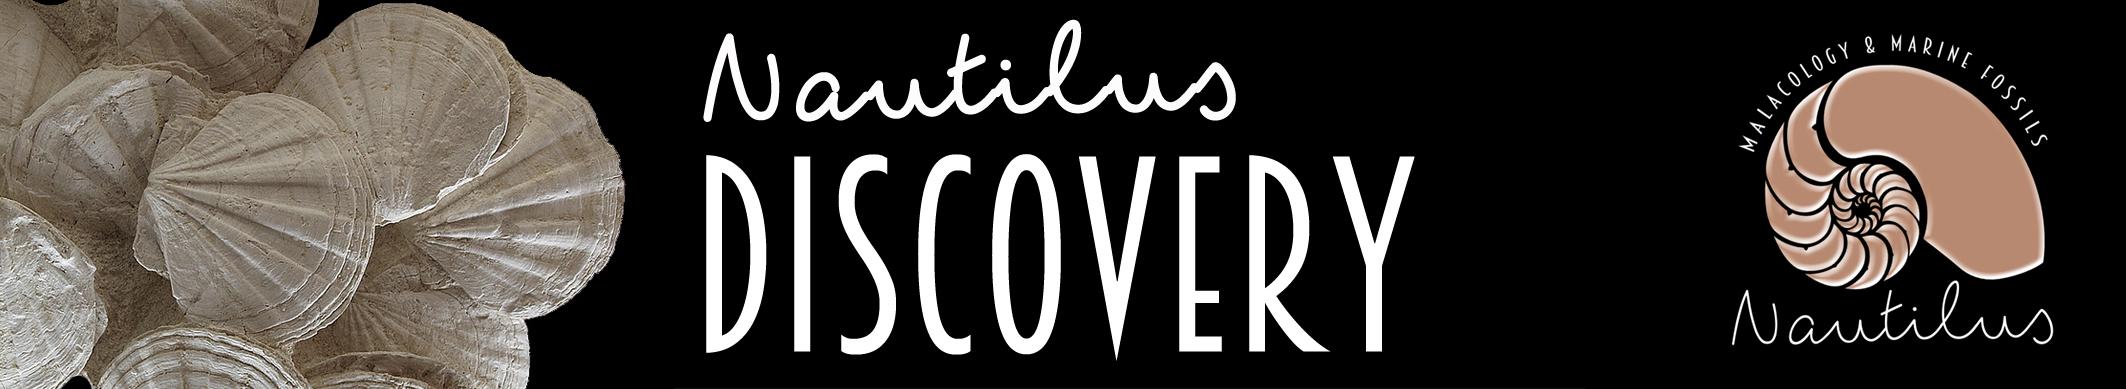 Nautilus Discovery